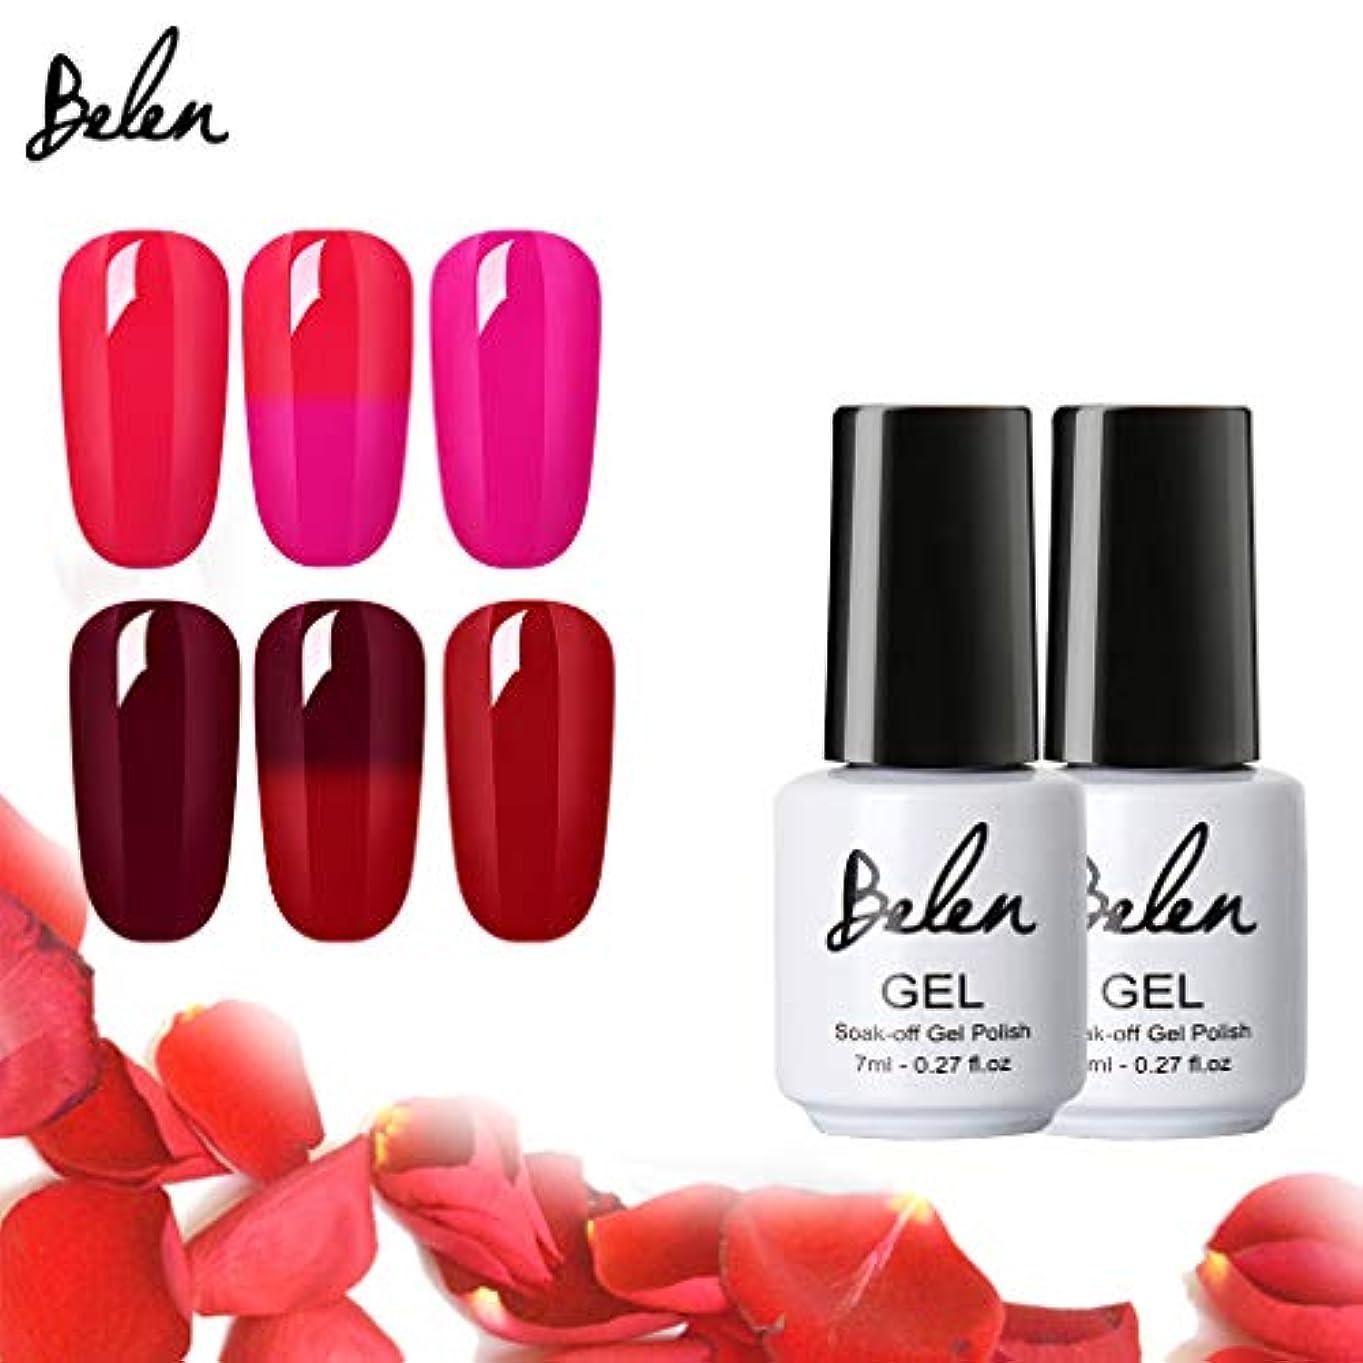 Belen ジェルネイル ワインレッド カメレオンカラージェル 温度により色が変化 UV/LED対応 全3色入り 7ML 【全3色選択可】